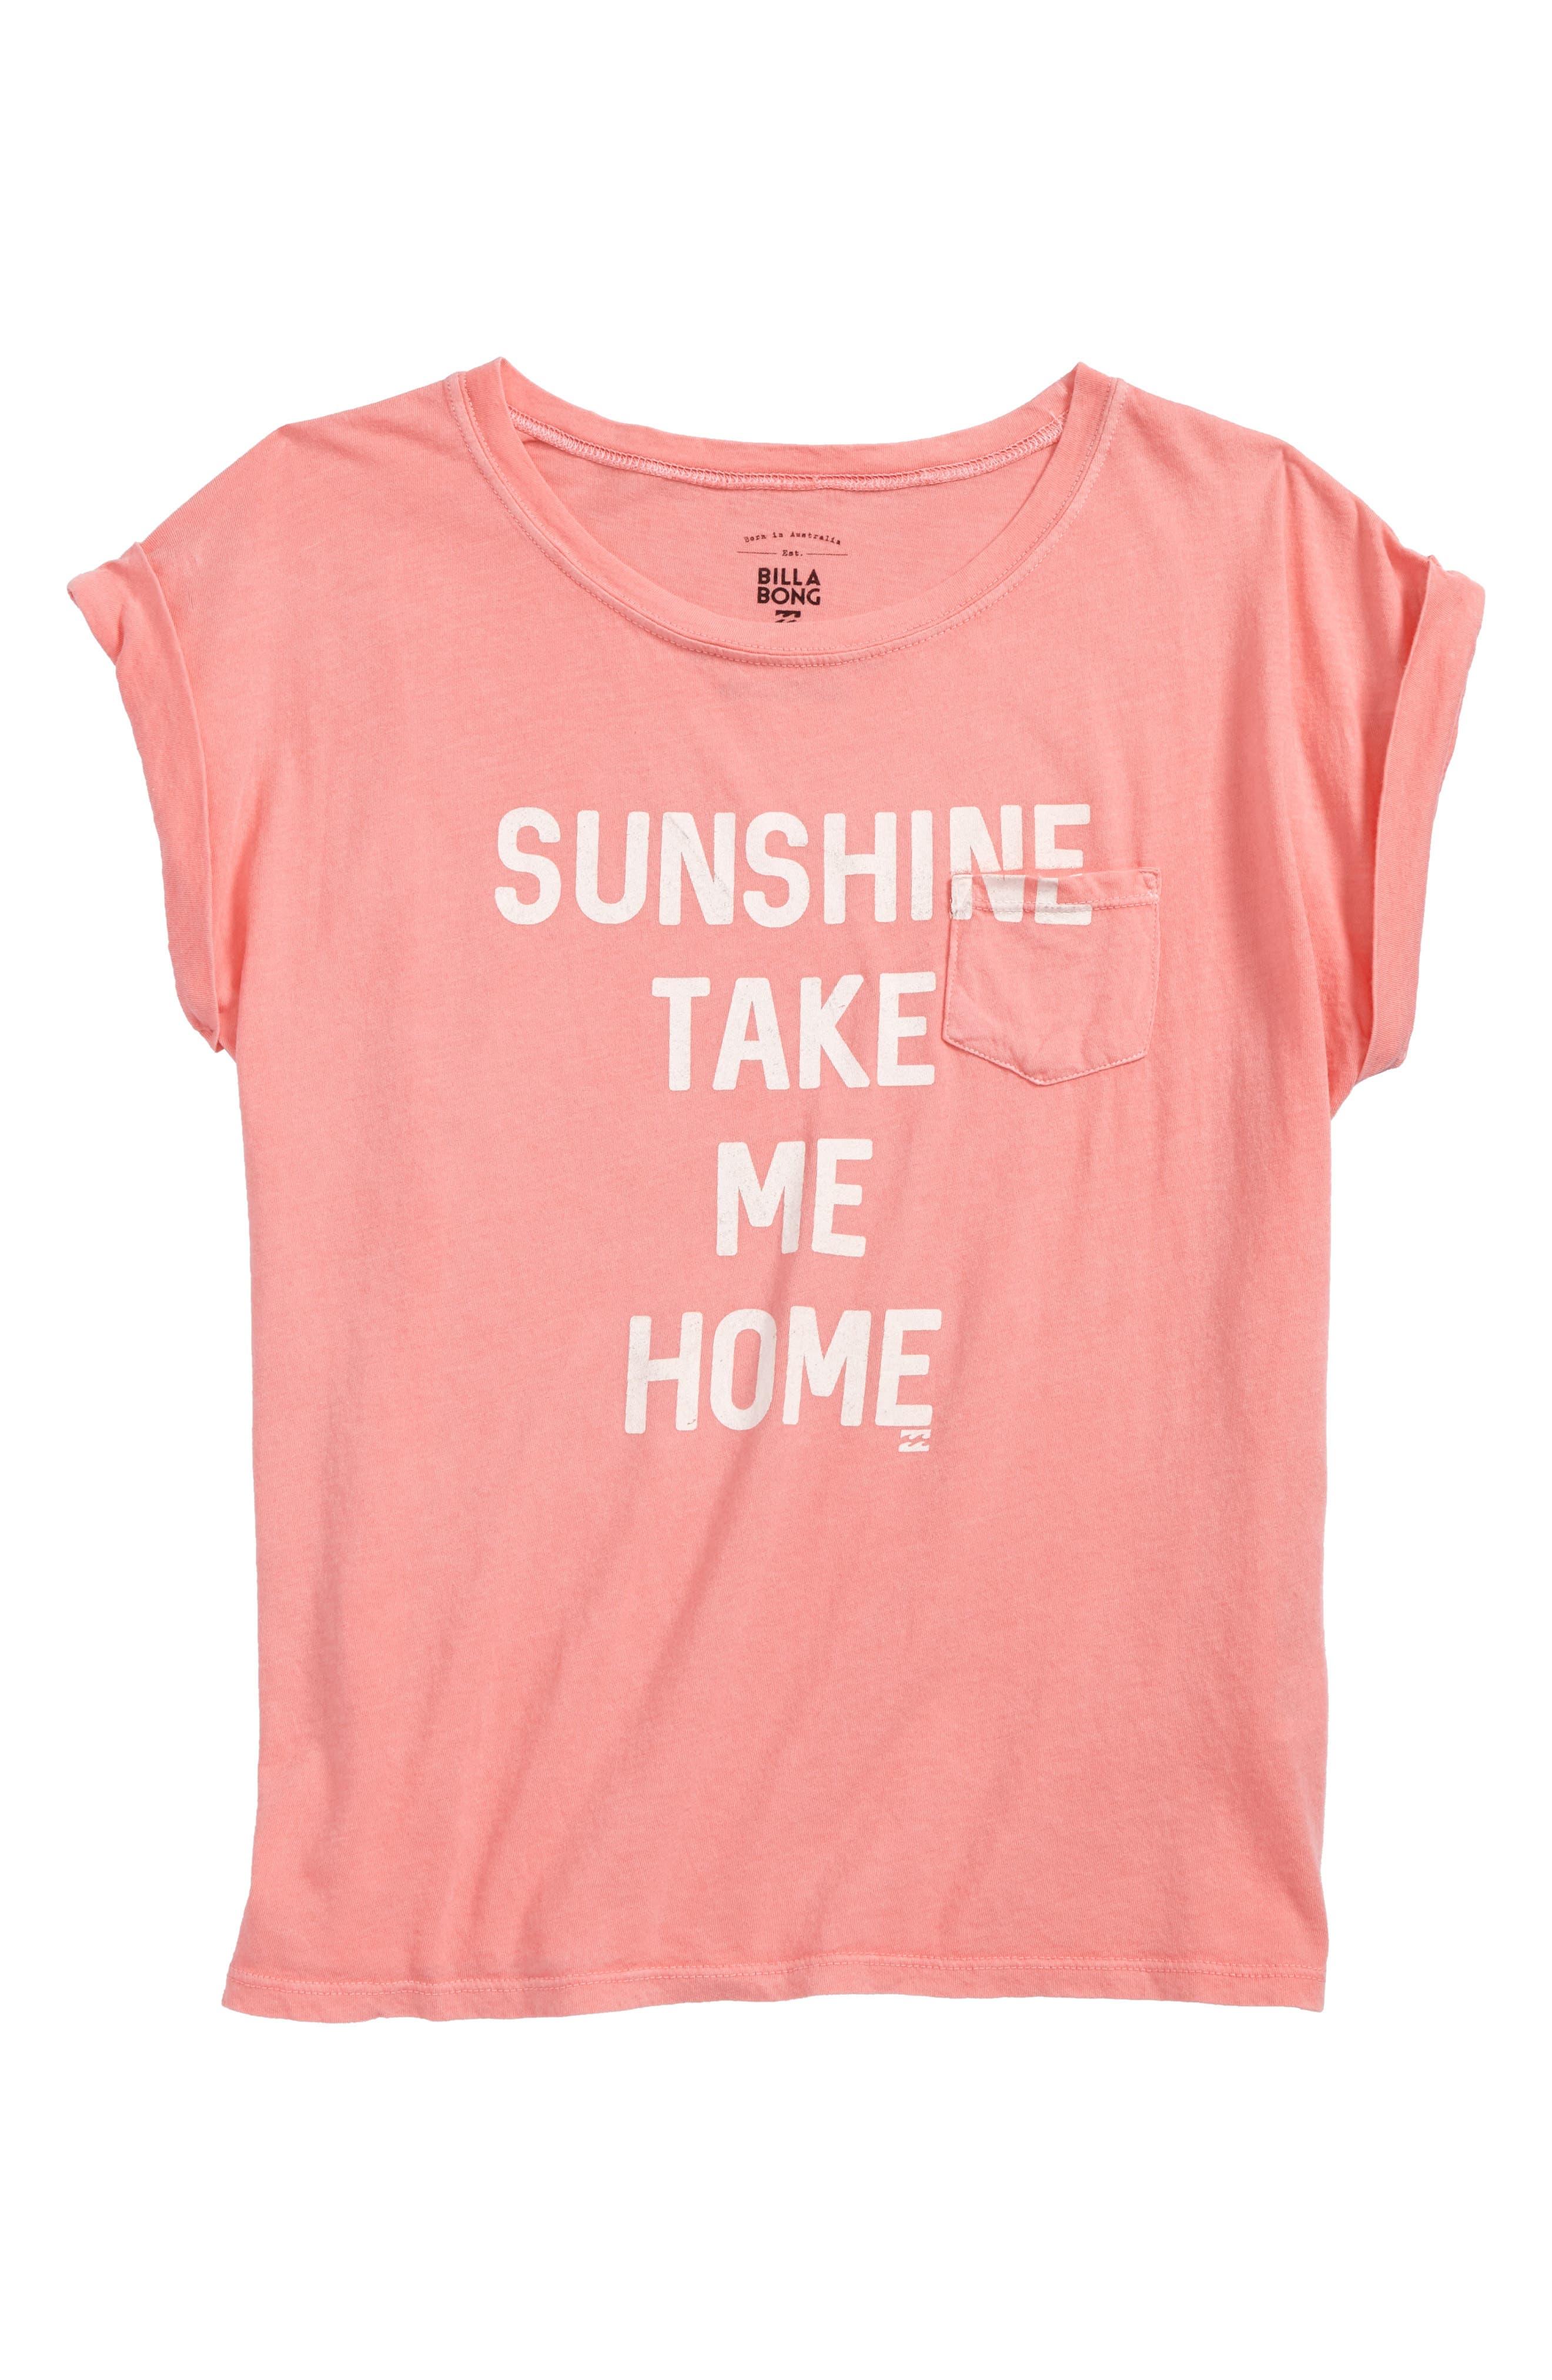 Sunshine Take Me Home Graphic Tee,                             Main thumbnail 1, color,                             950